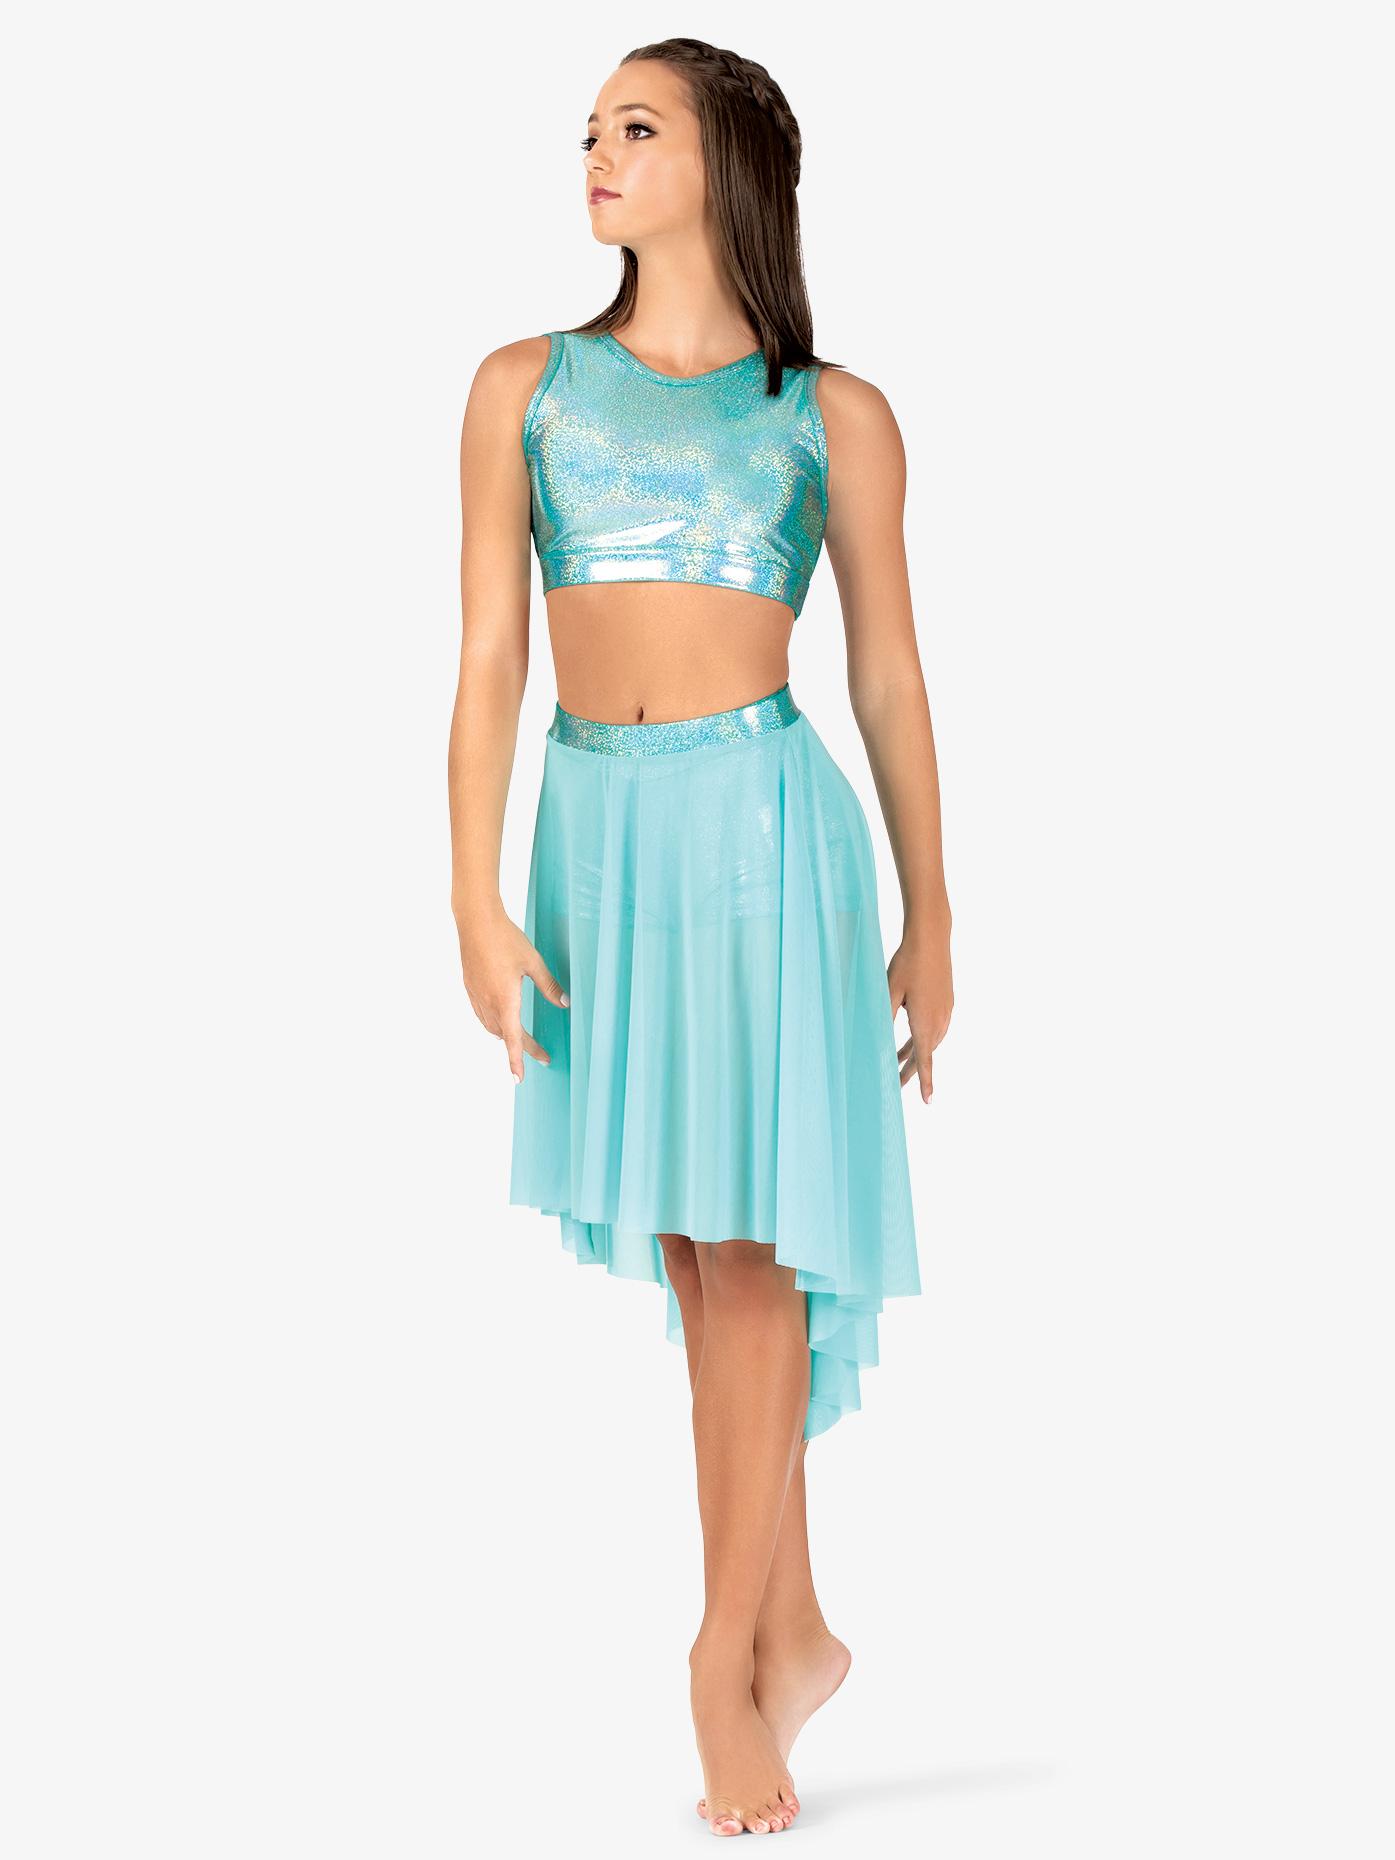 Ingenue Womens Iridescent Waistband Performance High-Low Skirt ING146